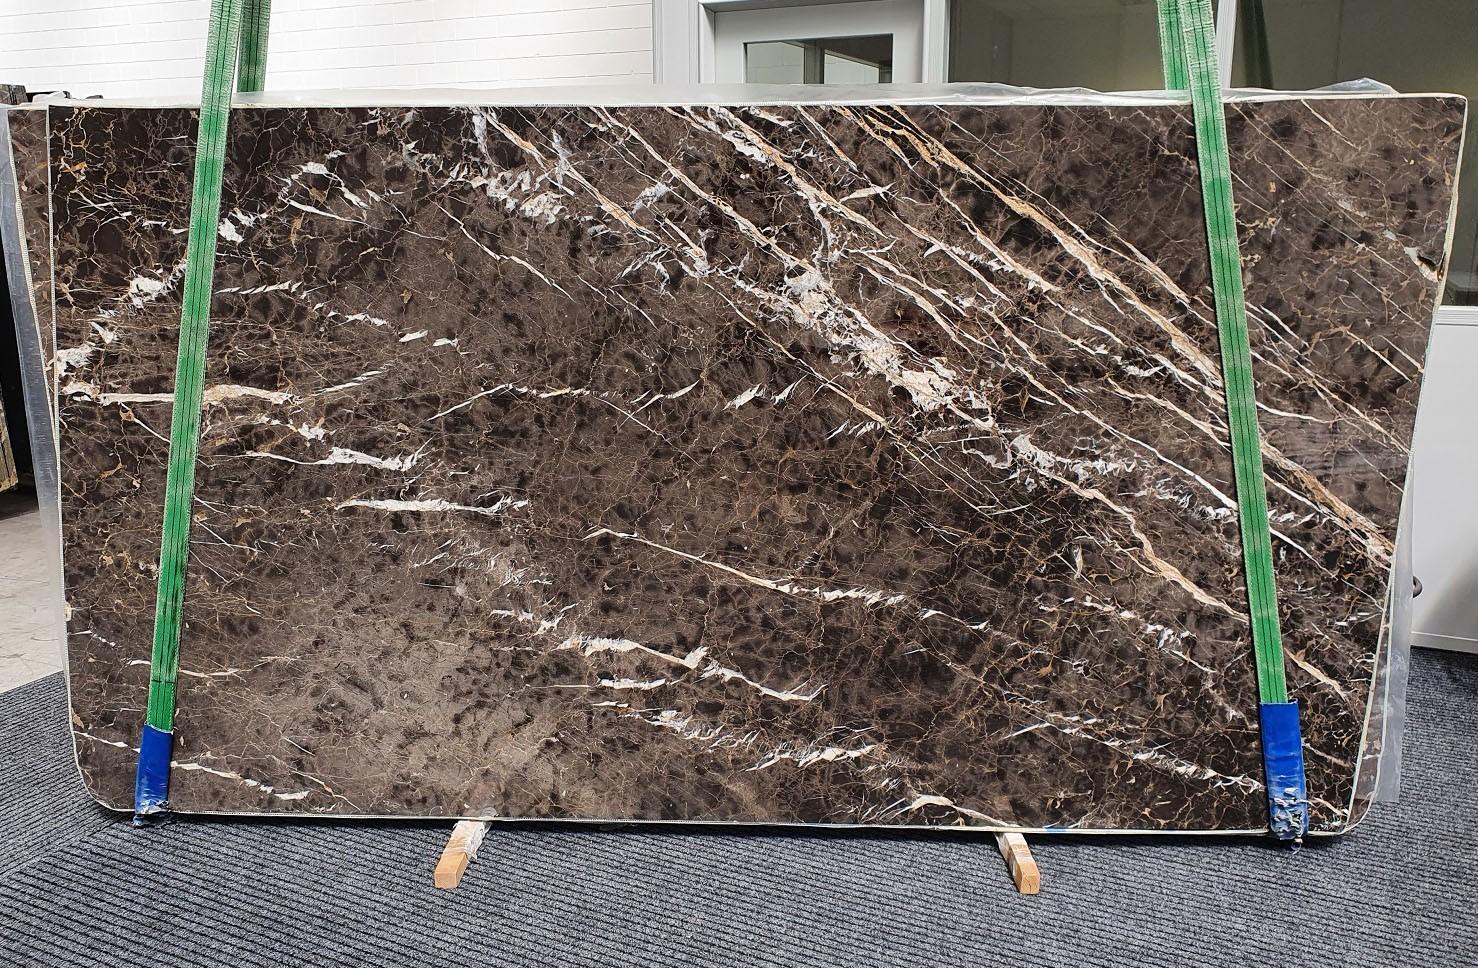 MARRON IRIS Fourniture Veneto (Italie) d' dalles brillantes en marbre naturel 1404 , Slab #34